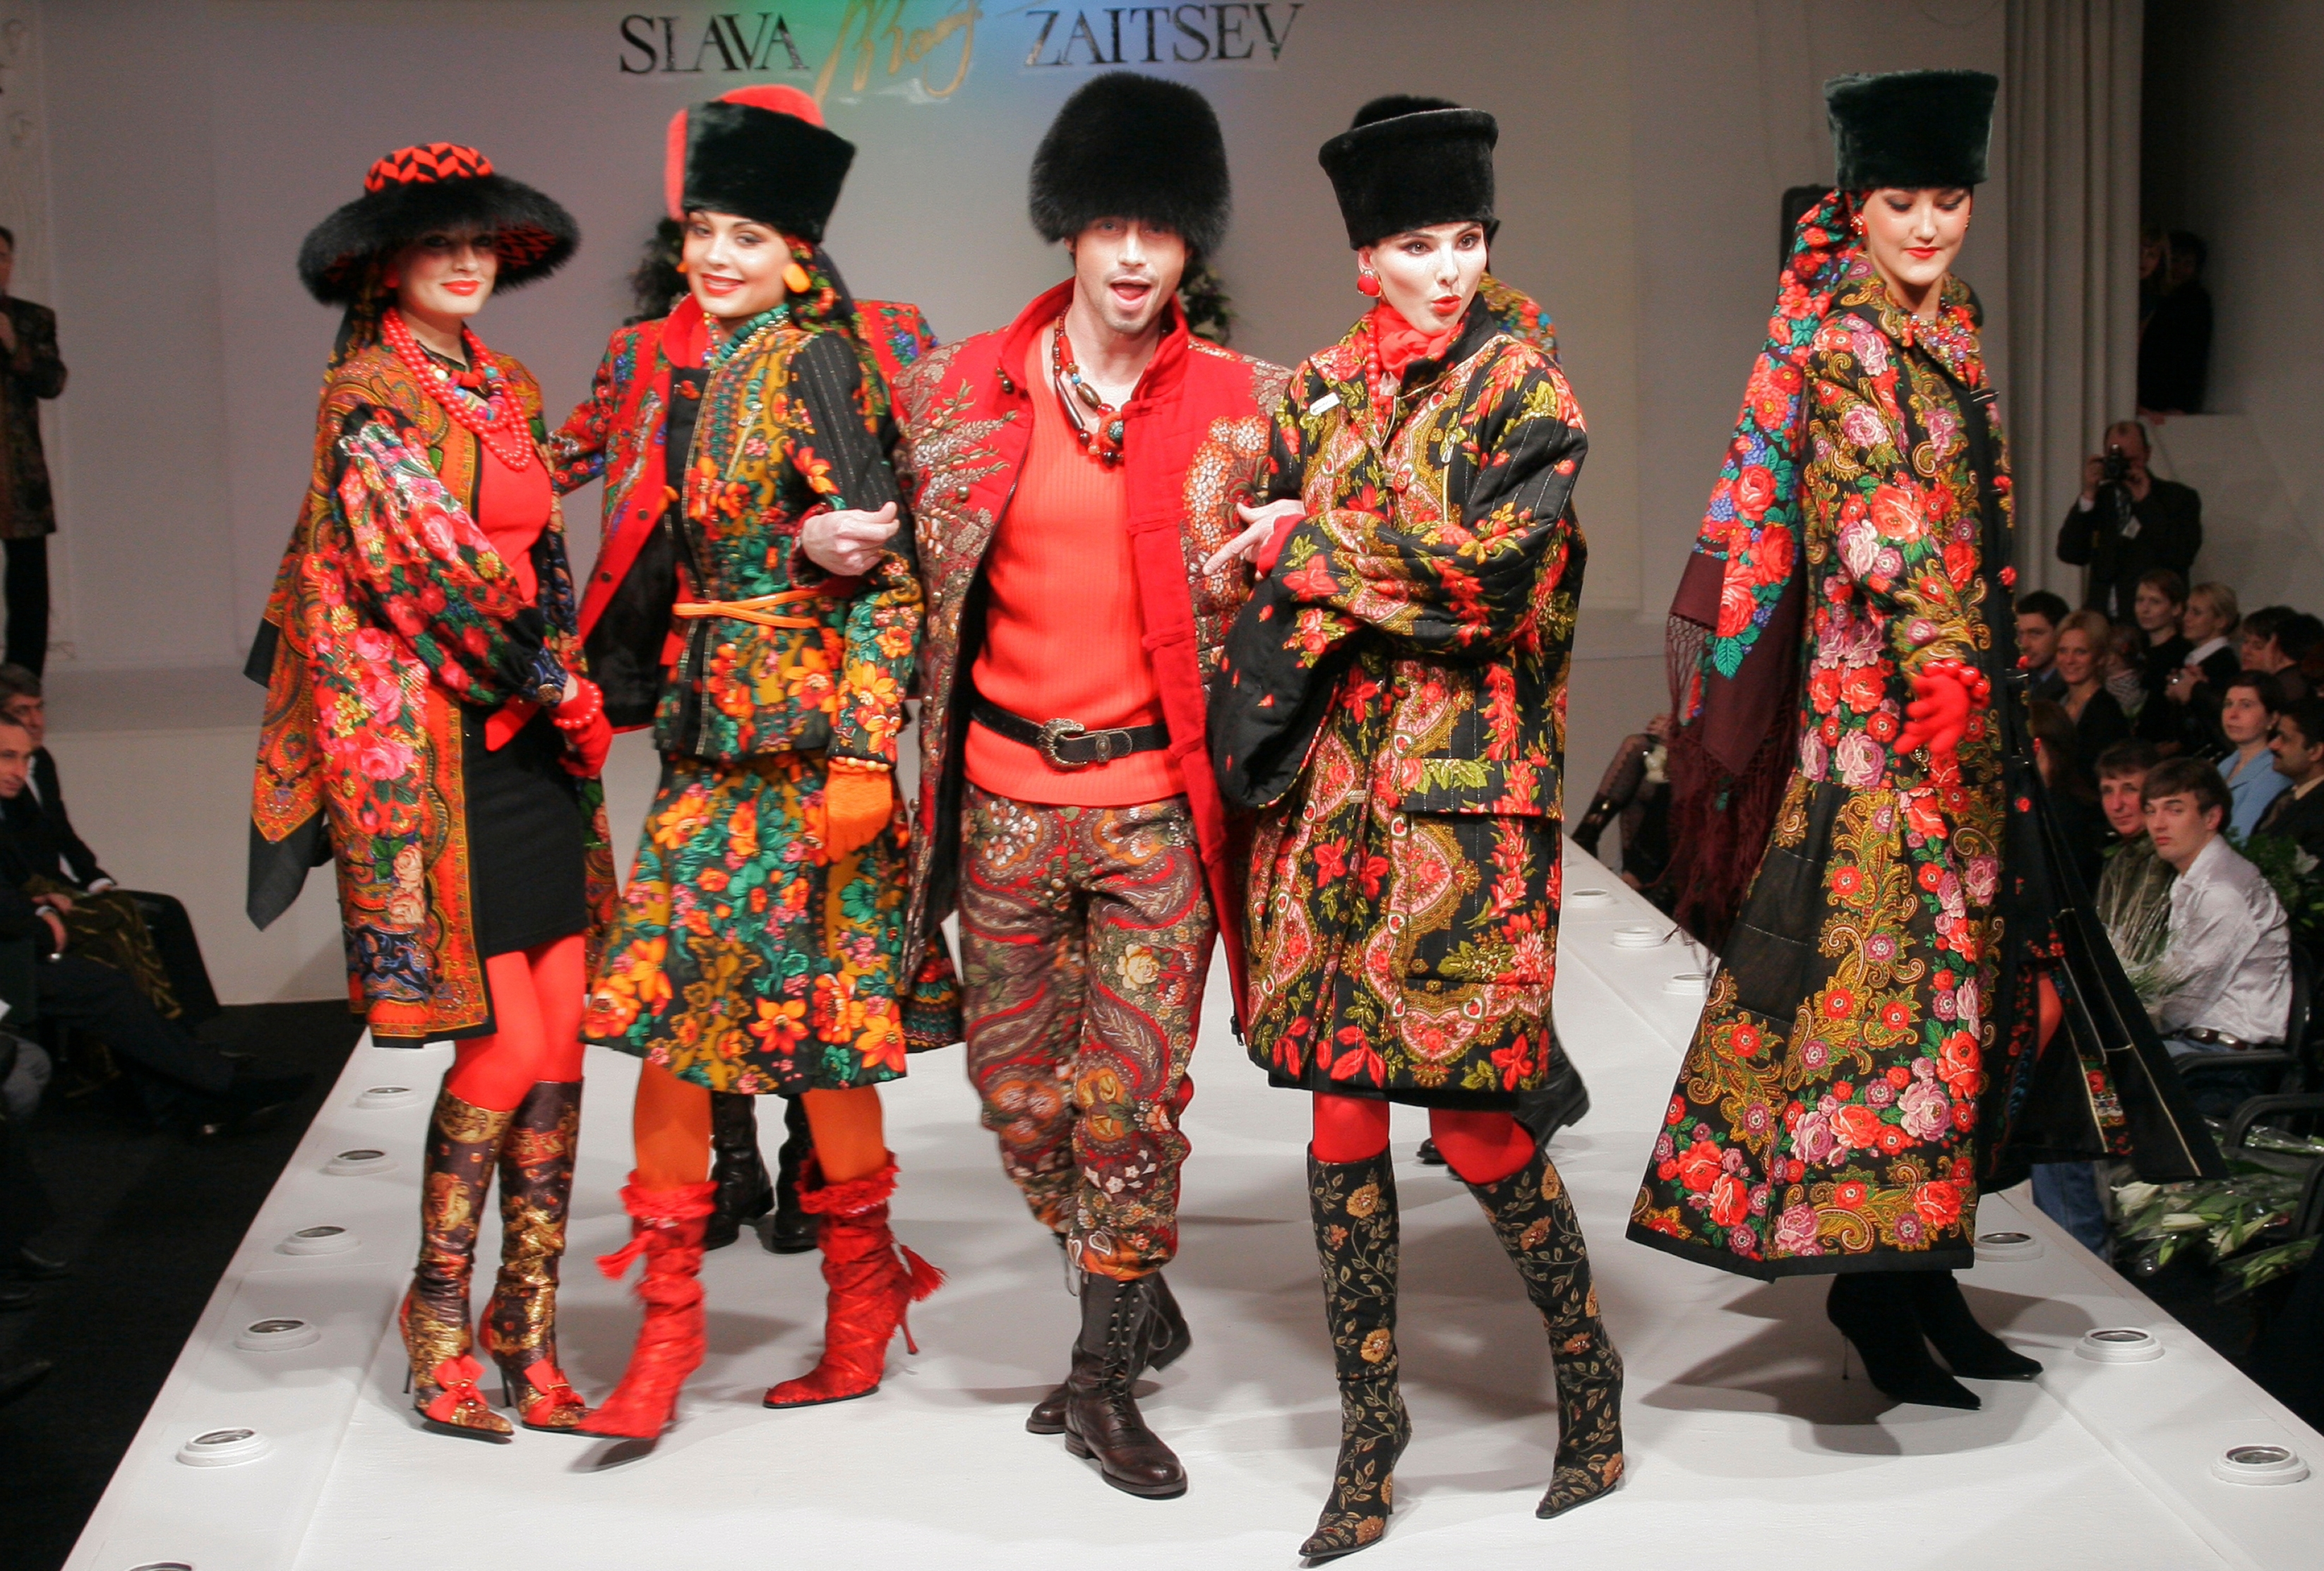 modern russian clothing - 800×541